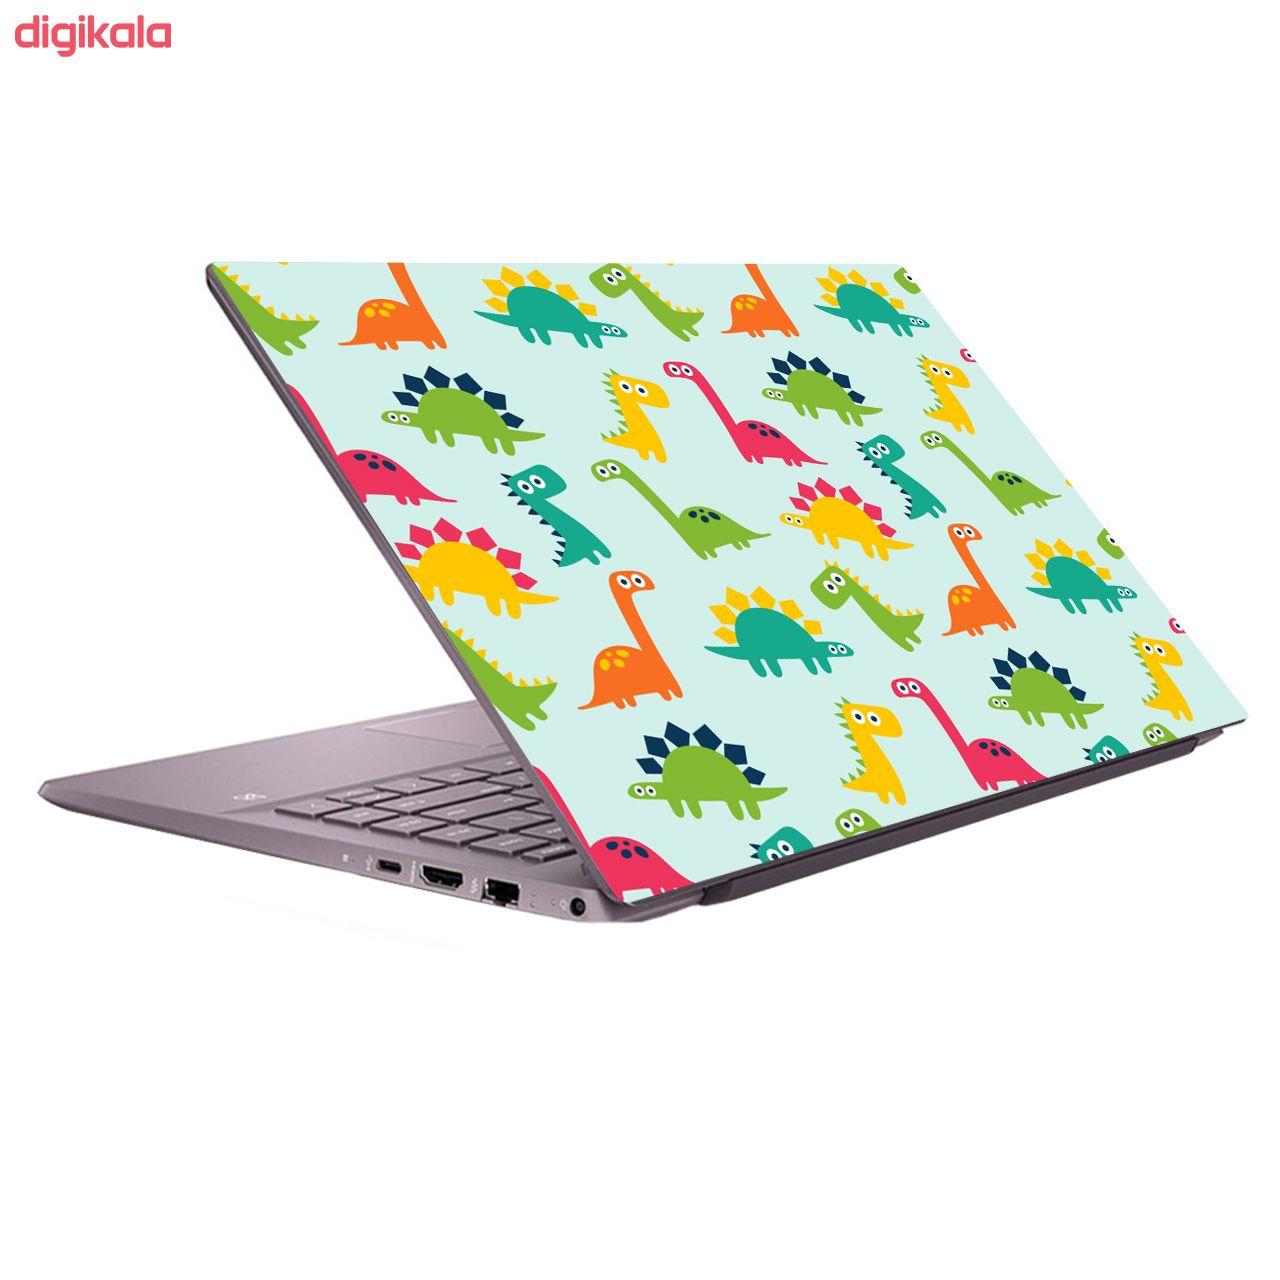 استیکر لپ تاپ صالسو آرت مدل 5029 hk به همراه برچسب حروف فارسی کیبورد main 1 1